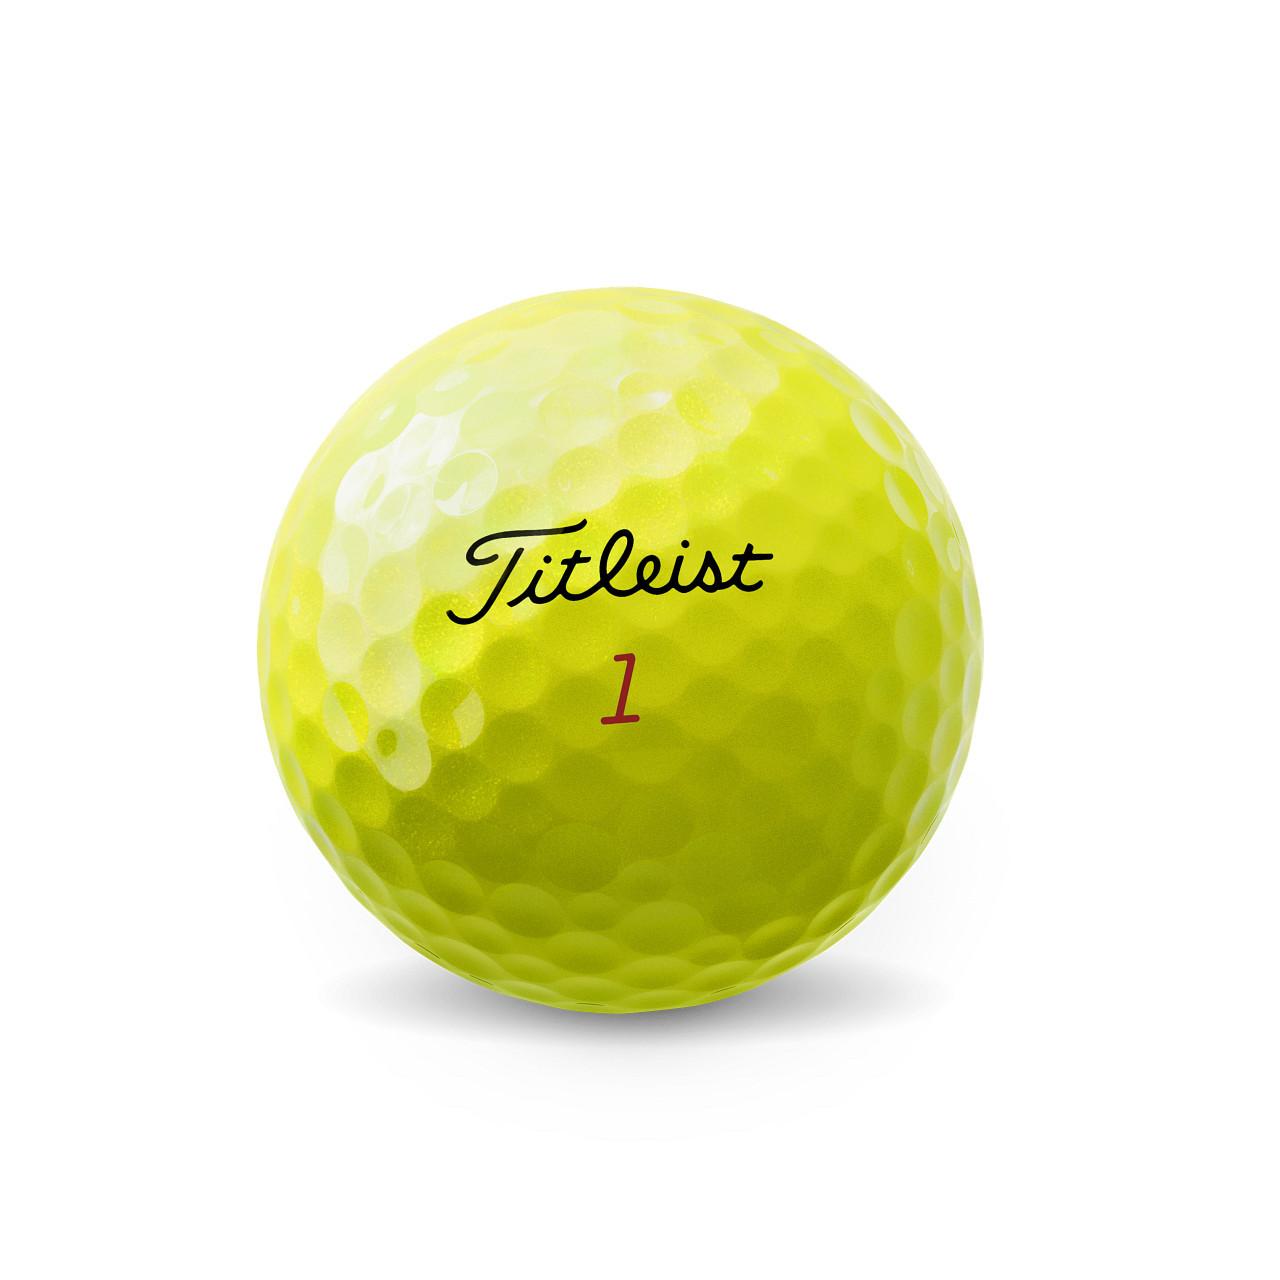 Titleist Personalized Pro V1x Yellow Dozen Golf Balls 2021